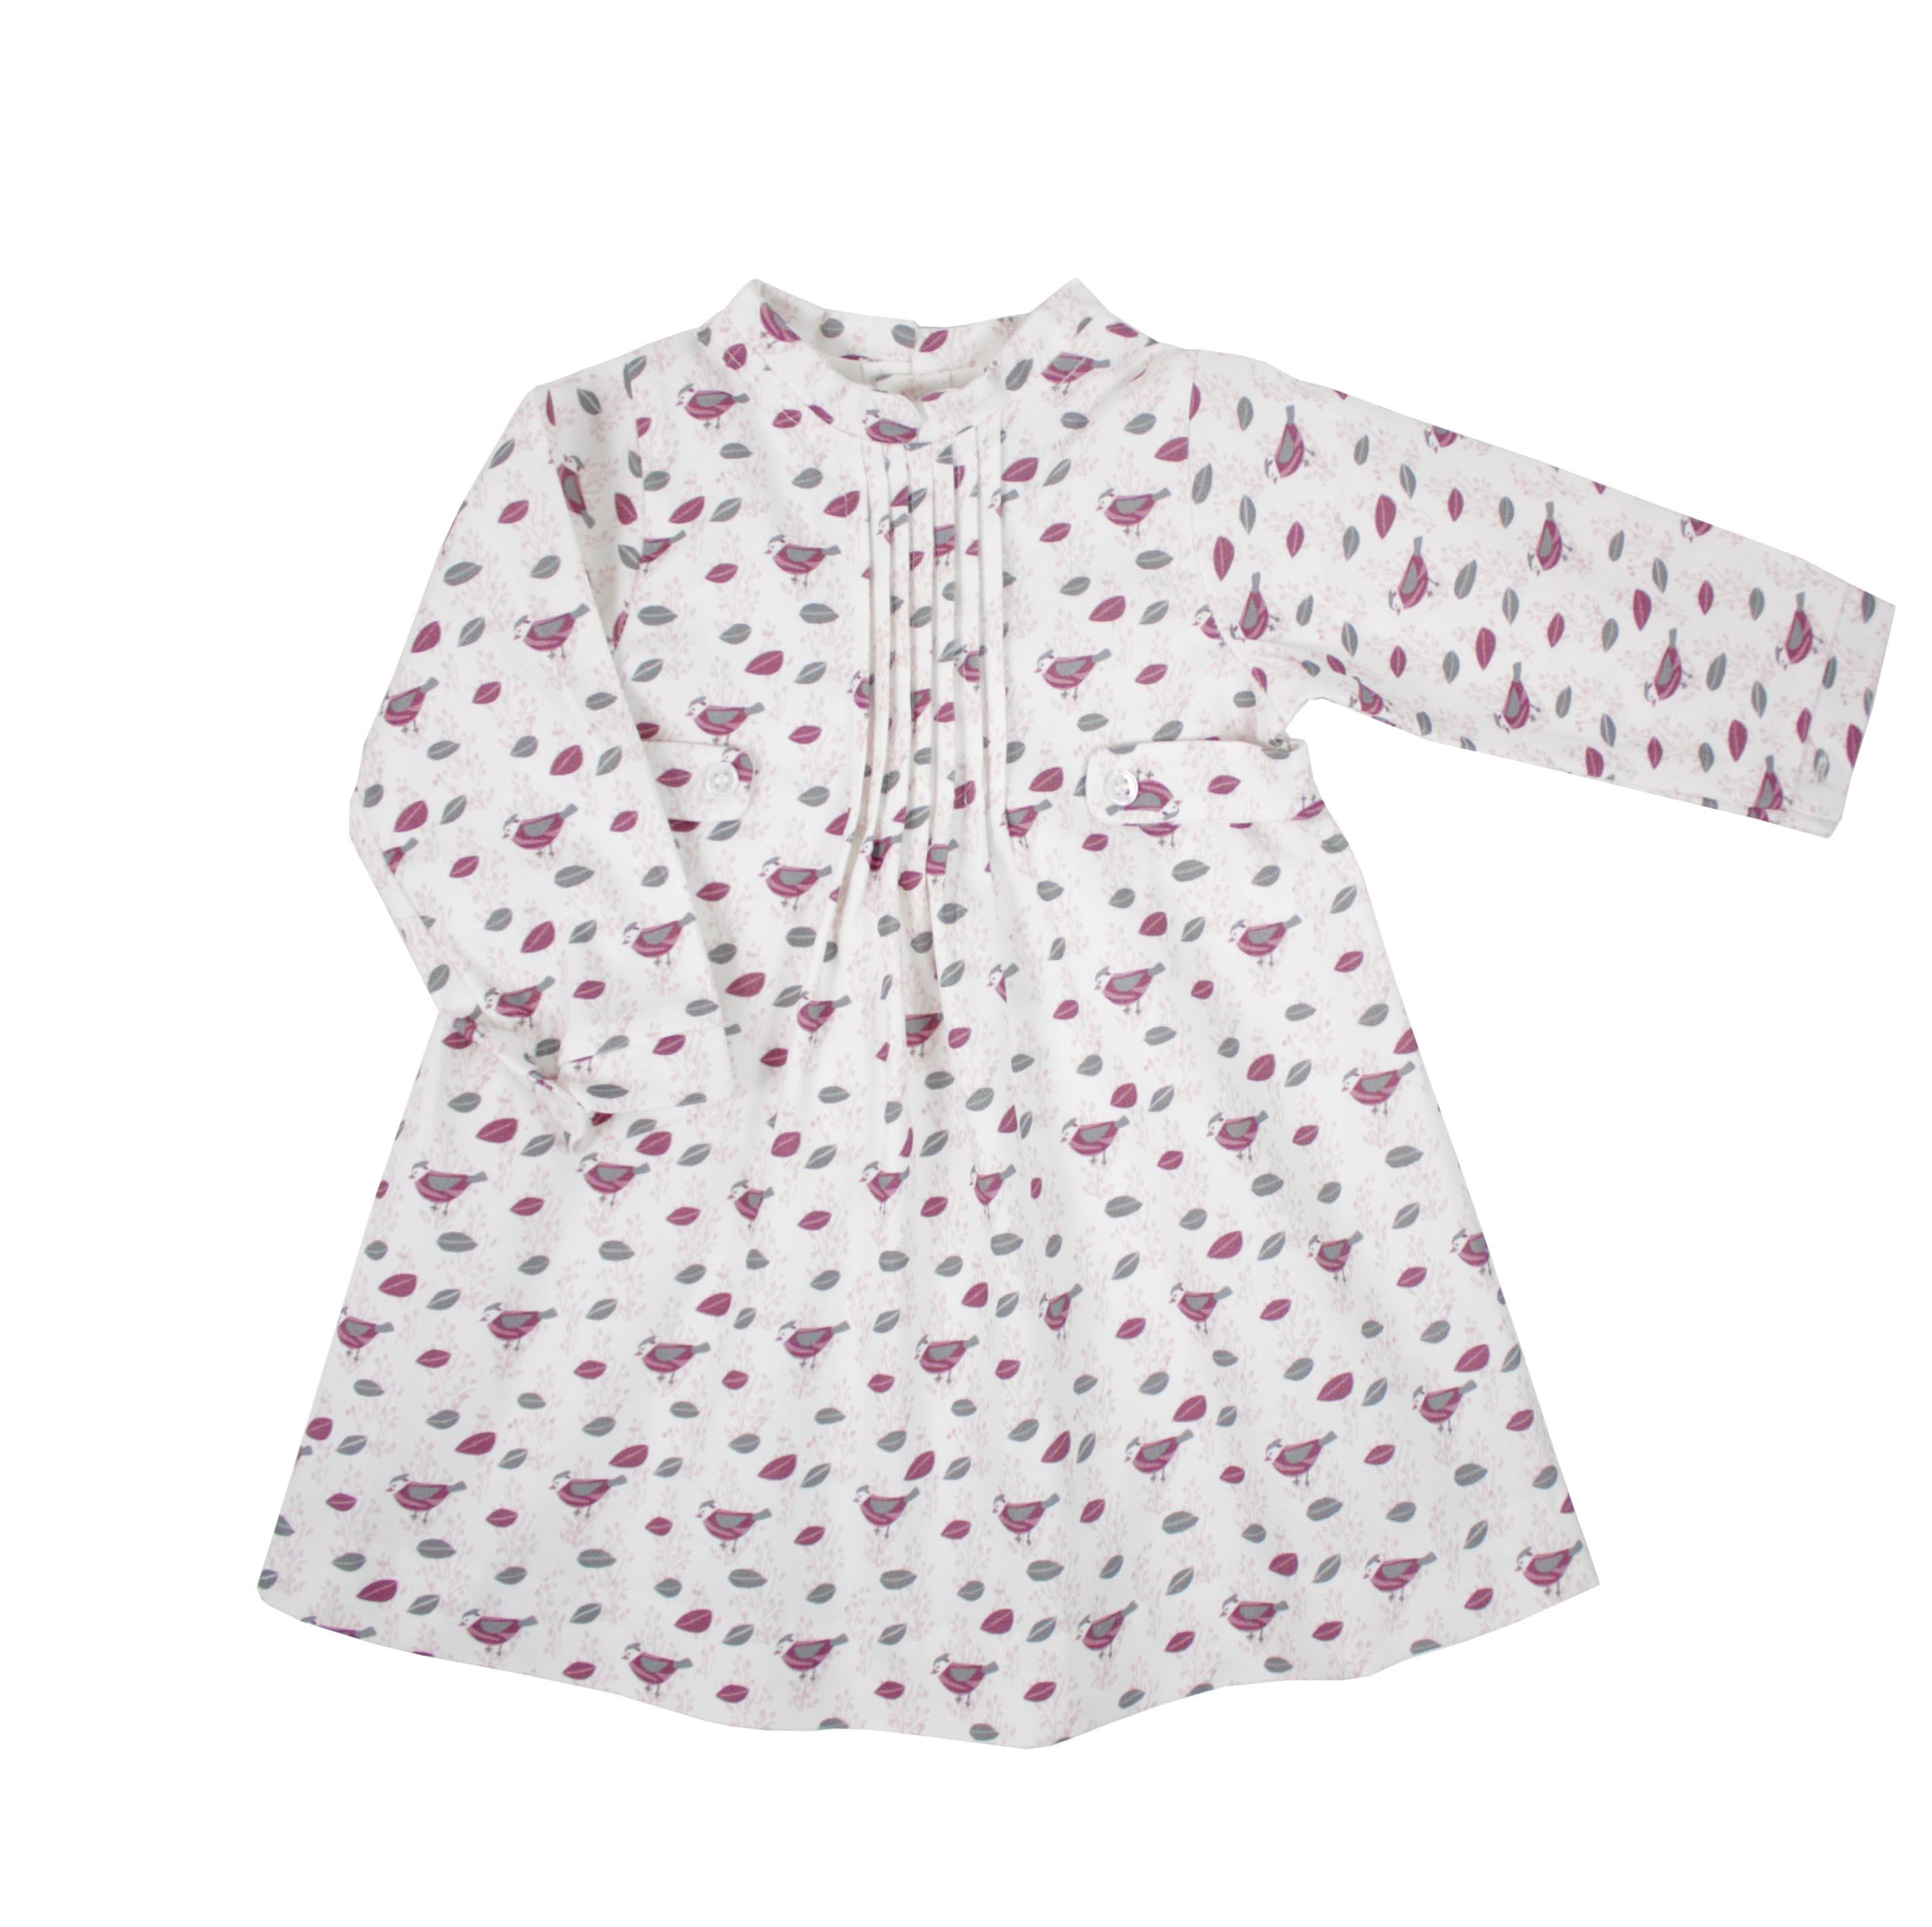 6f92ad82841 Girl dress long sleeve burgundy birds patterned. Lola dress